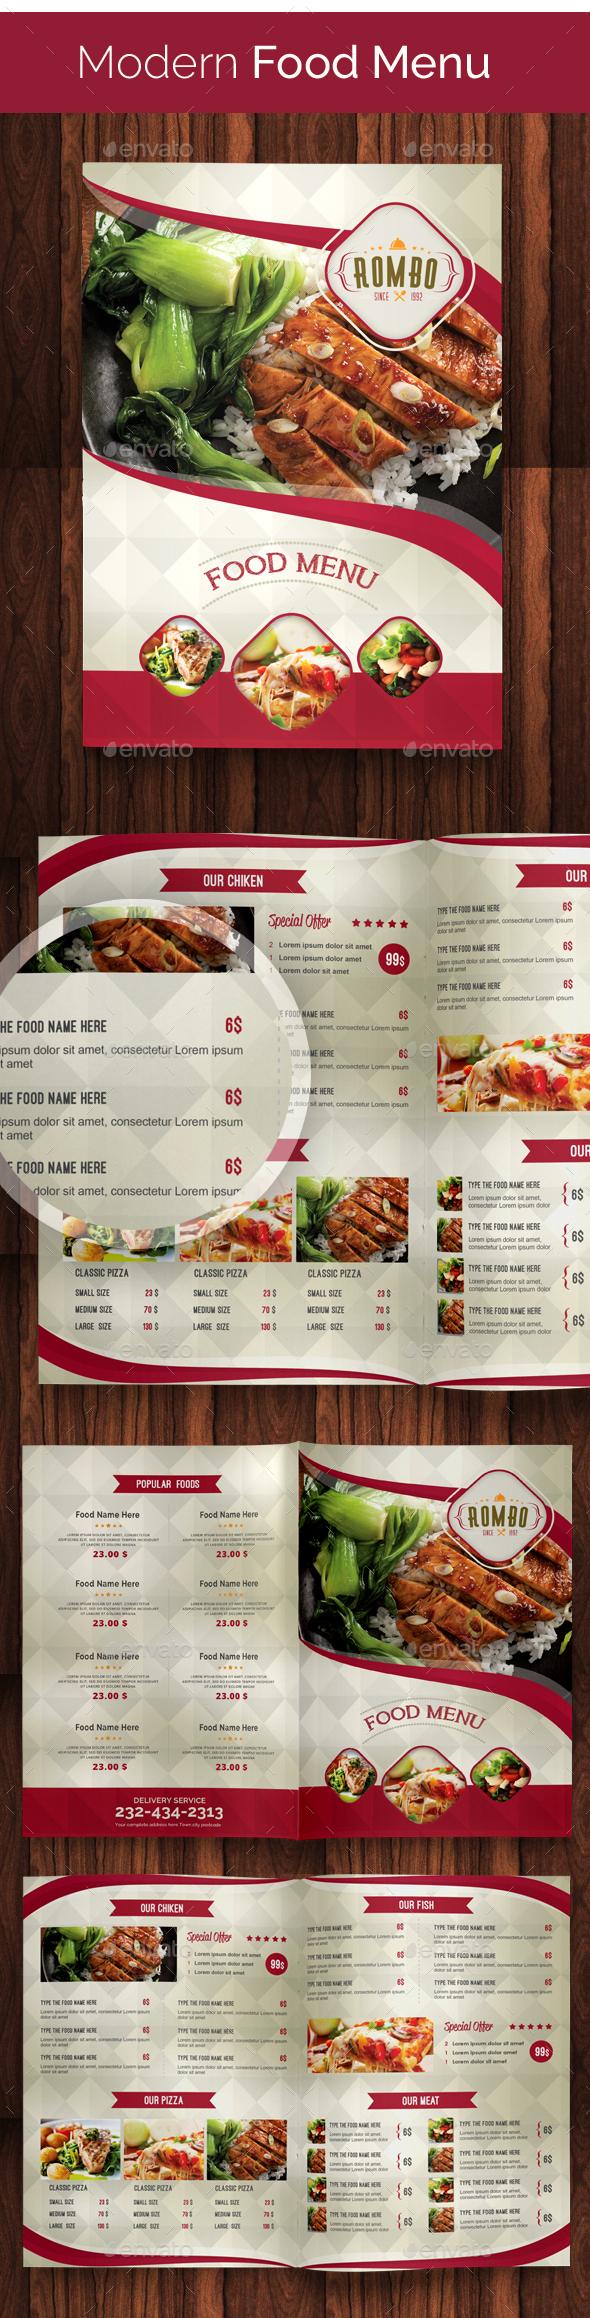 Modern Food Menu 02 - Food Menus Print Templates